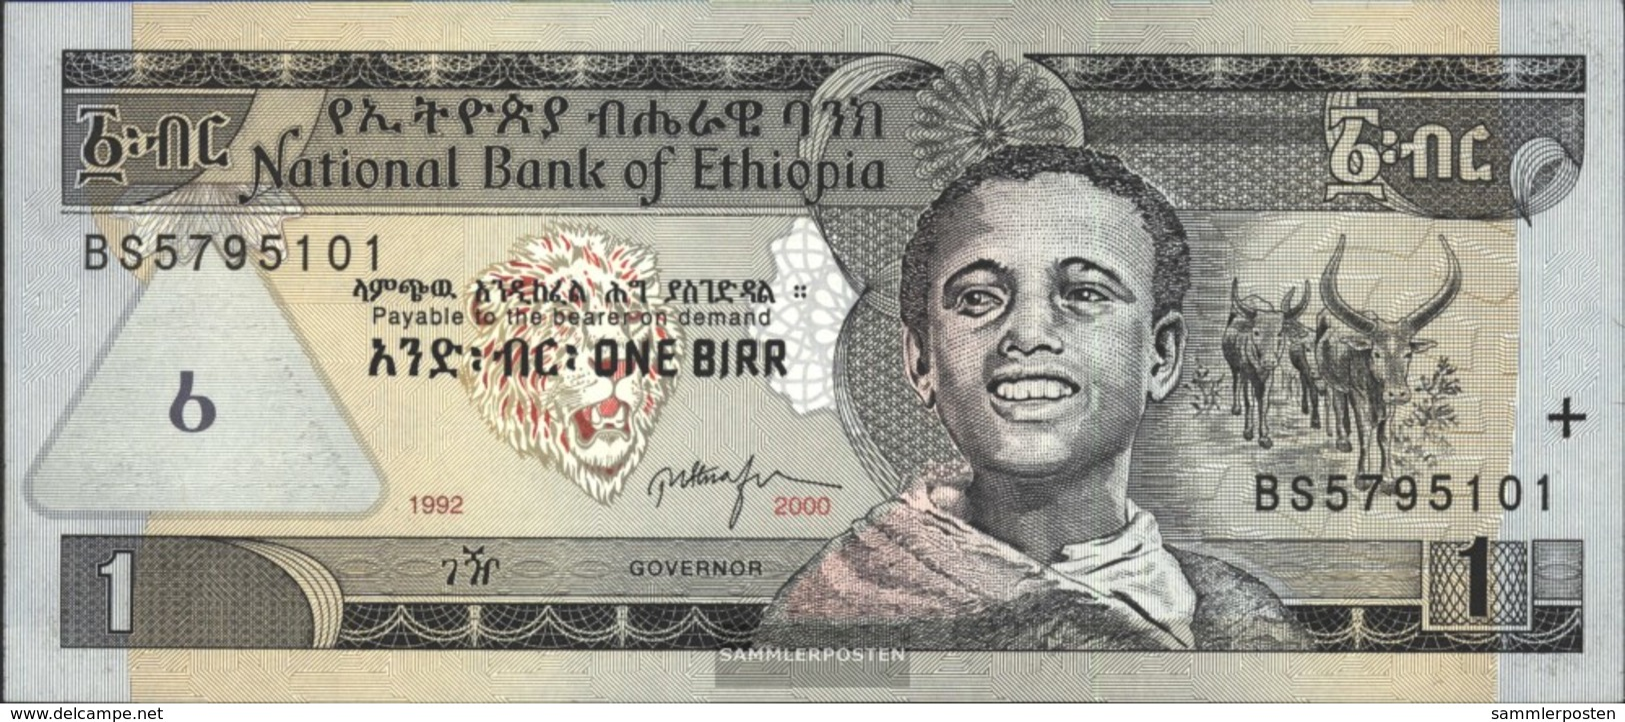 Äthiopien Pick-No.: 46b Nuevo 2000 1 Birr - Ethiopie